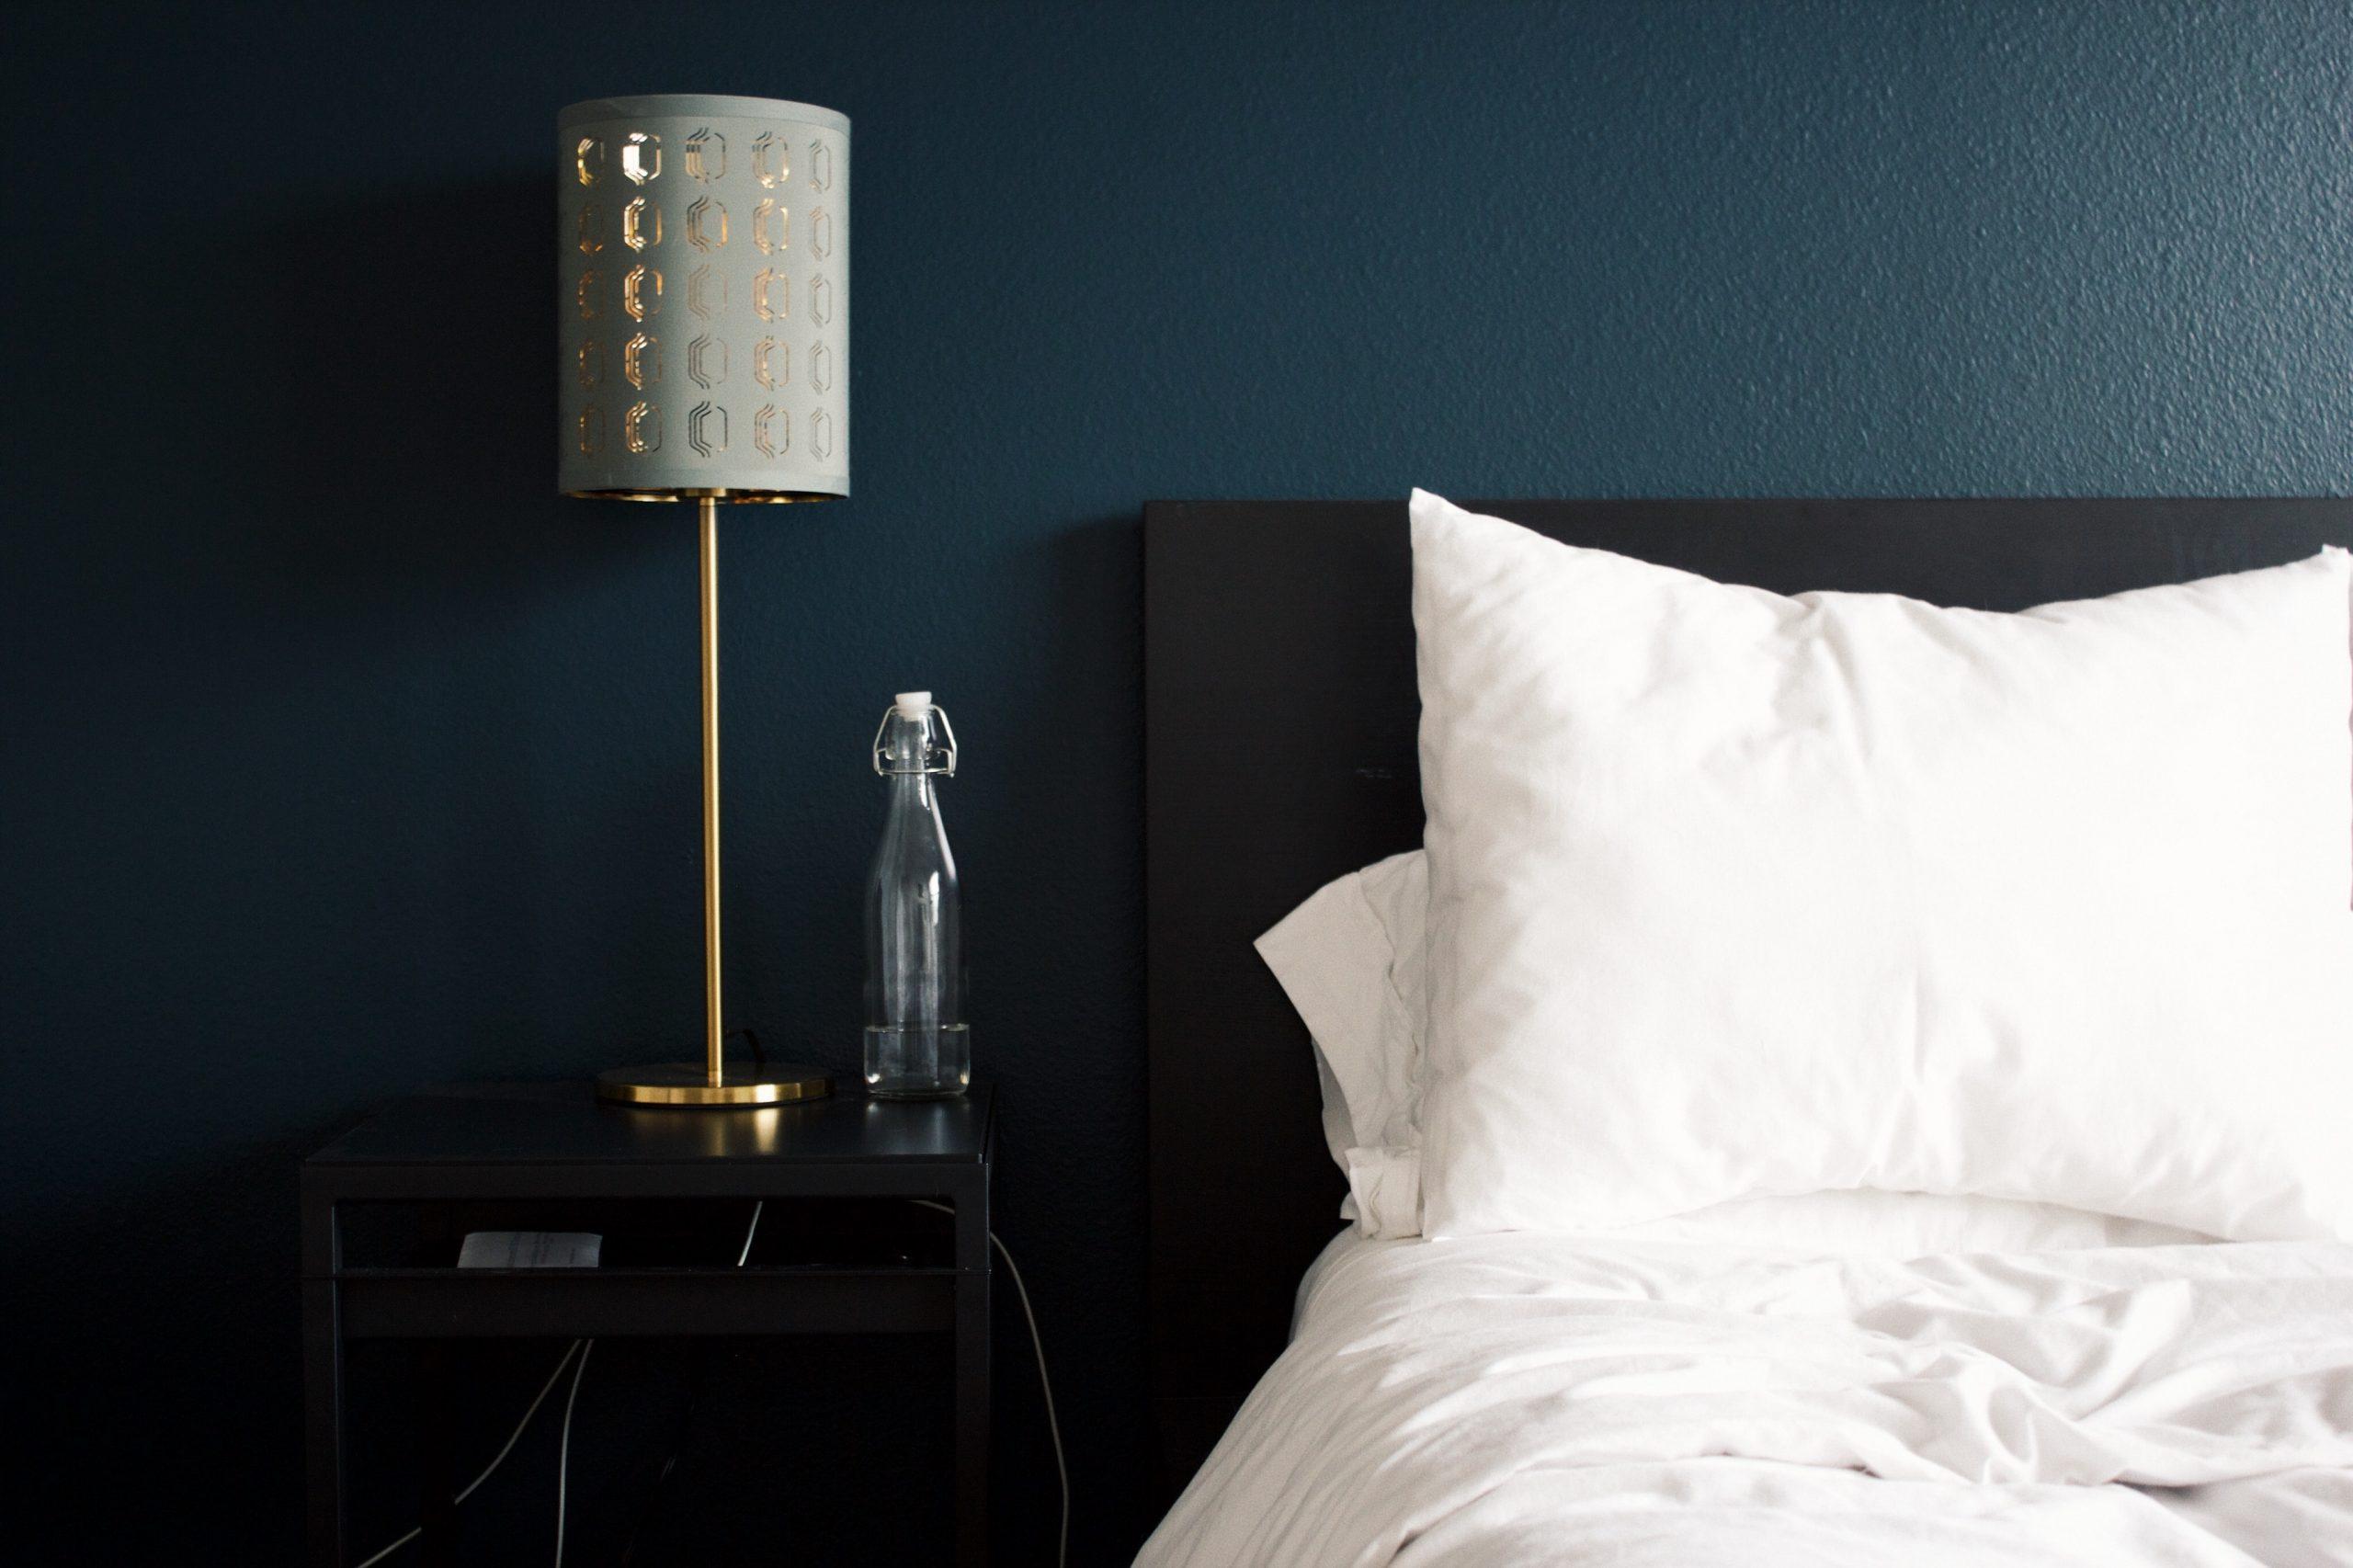 Blue Bedroom Decor ideas